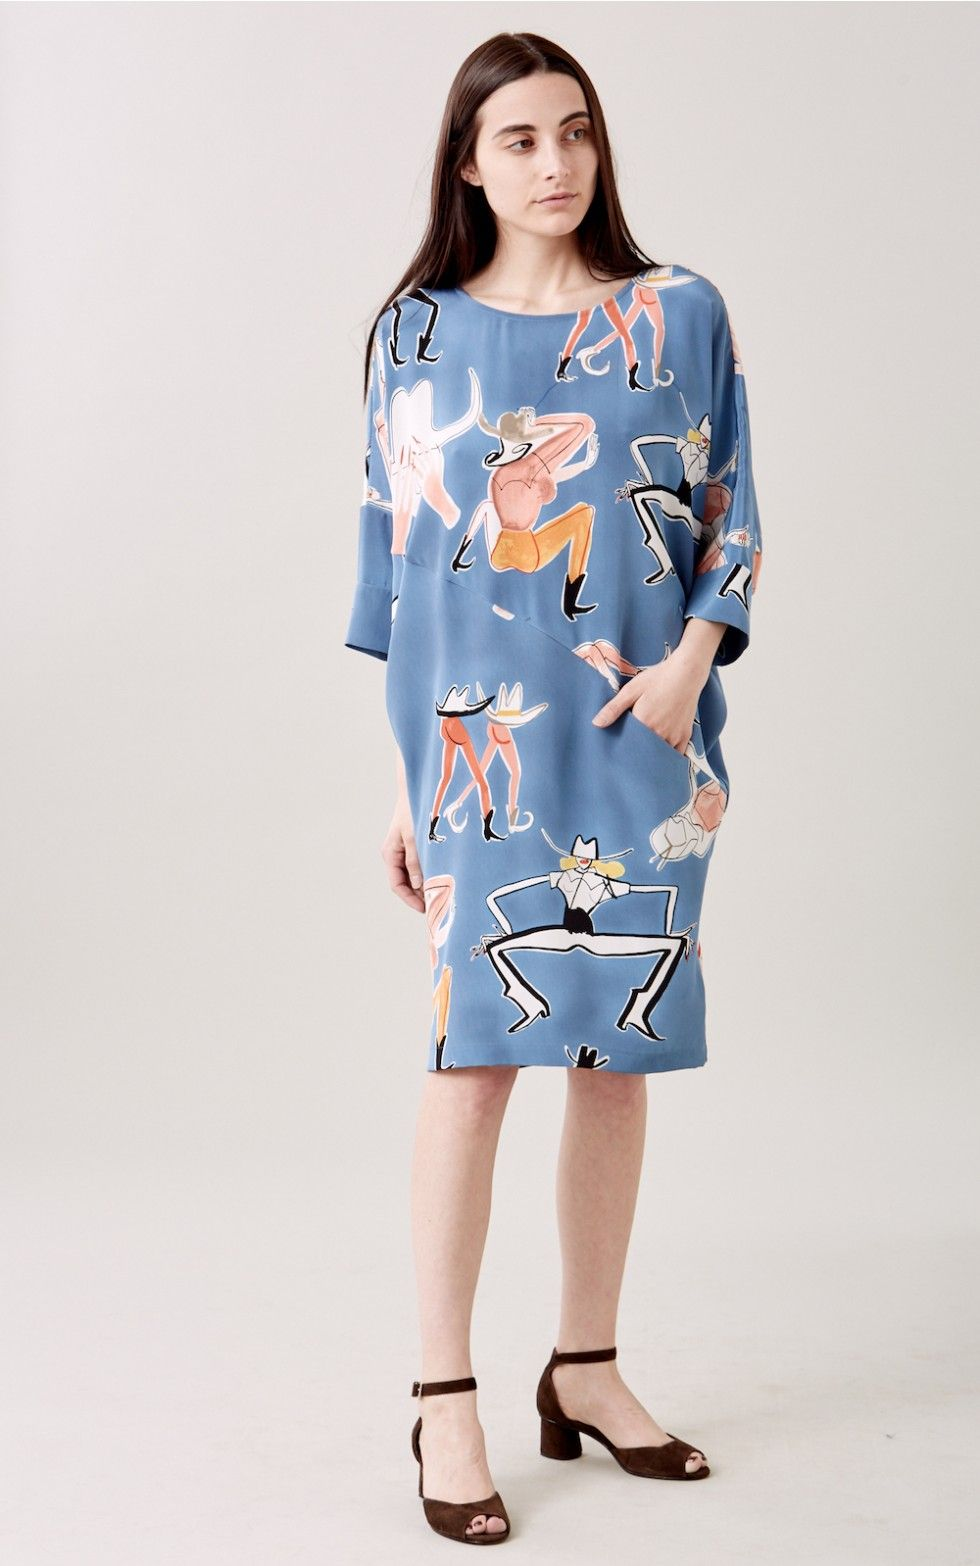 Wades Dress